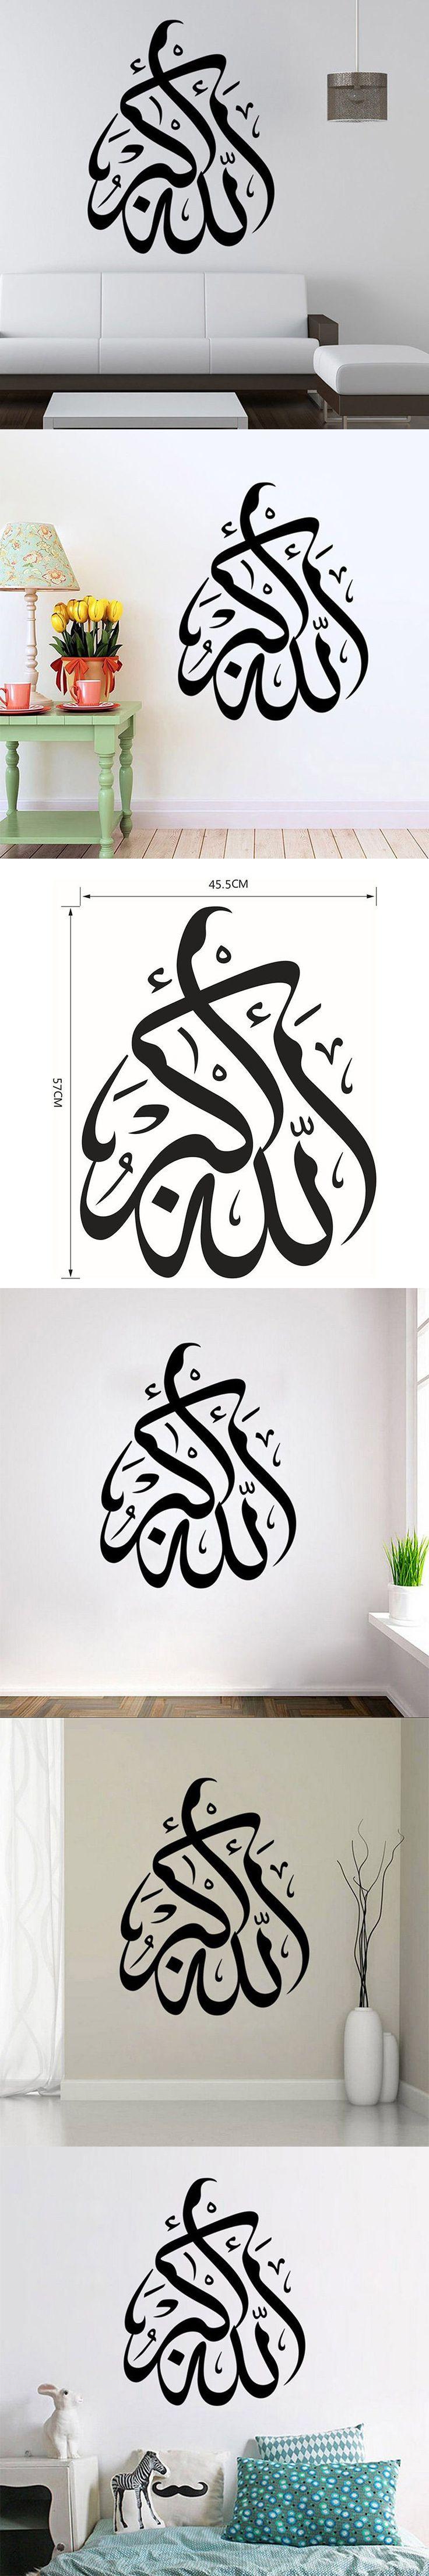 Stickers Islam Salon. Islam Pixerstick Sticker. Stickers Islam Salon ...